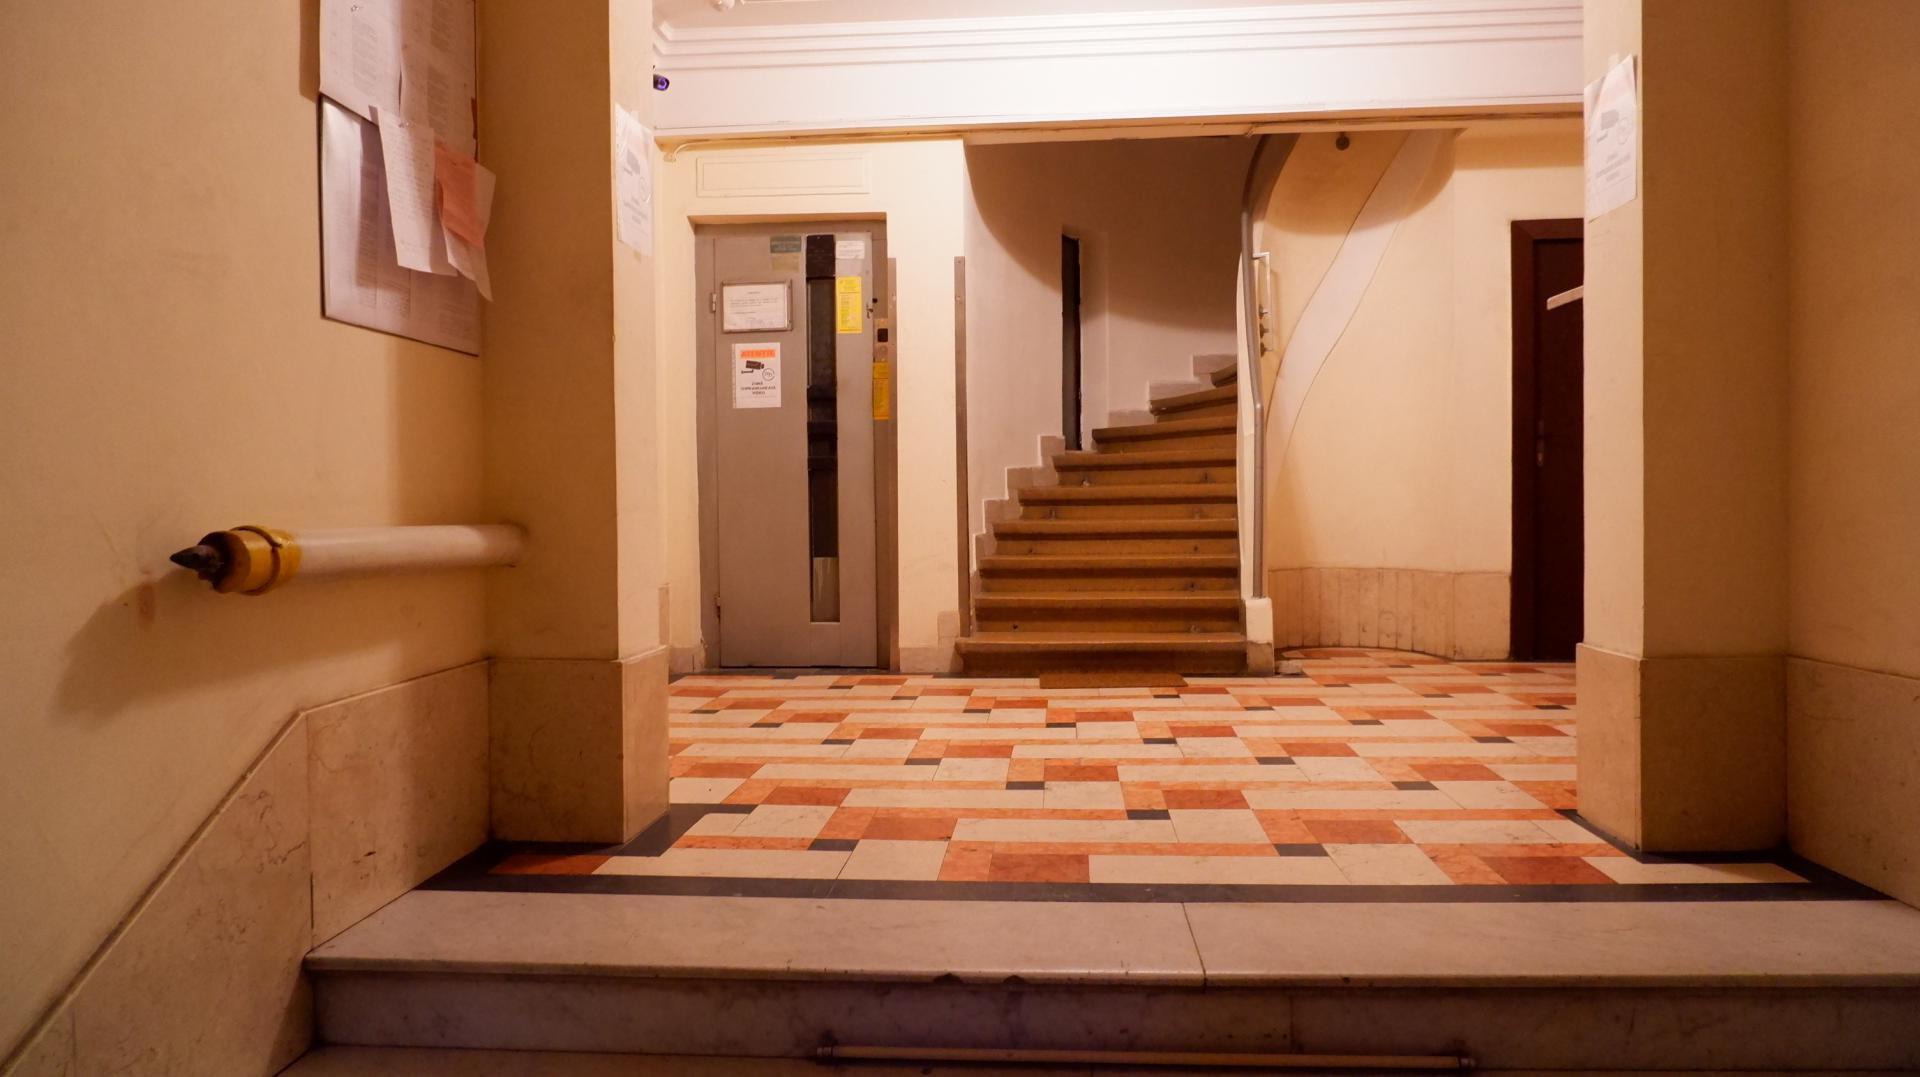 De inchiriat 3 Camere | Unirii | Parcare | Terasa |Metrou |Mitropolie